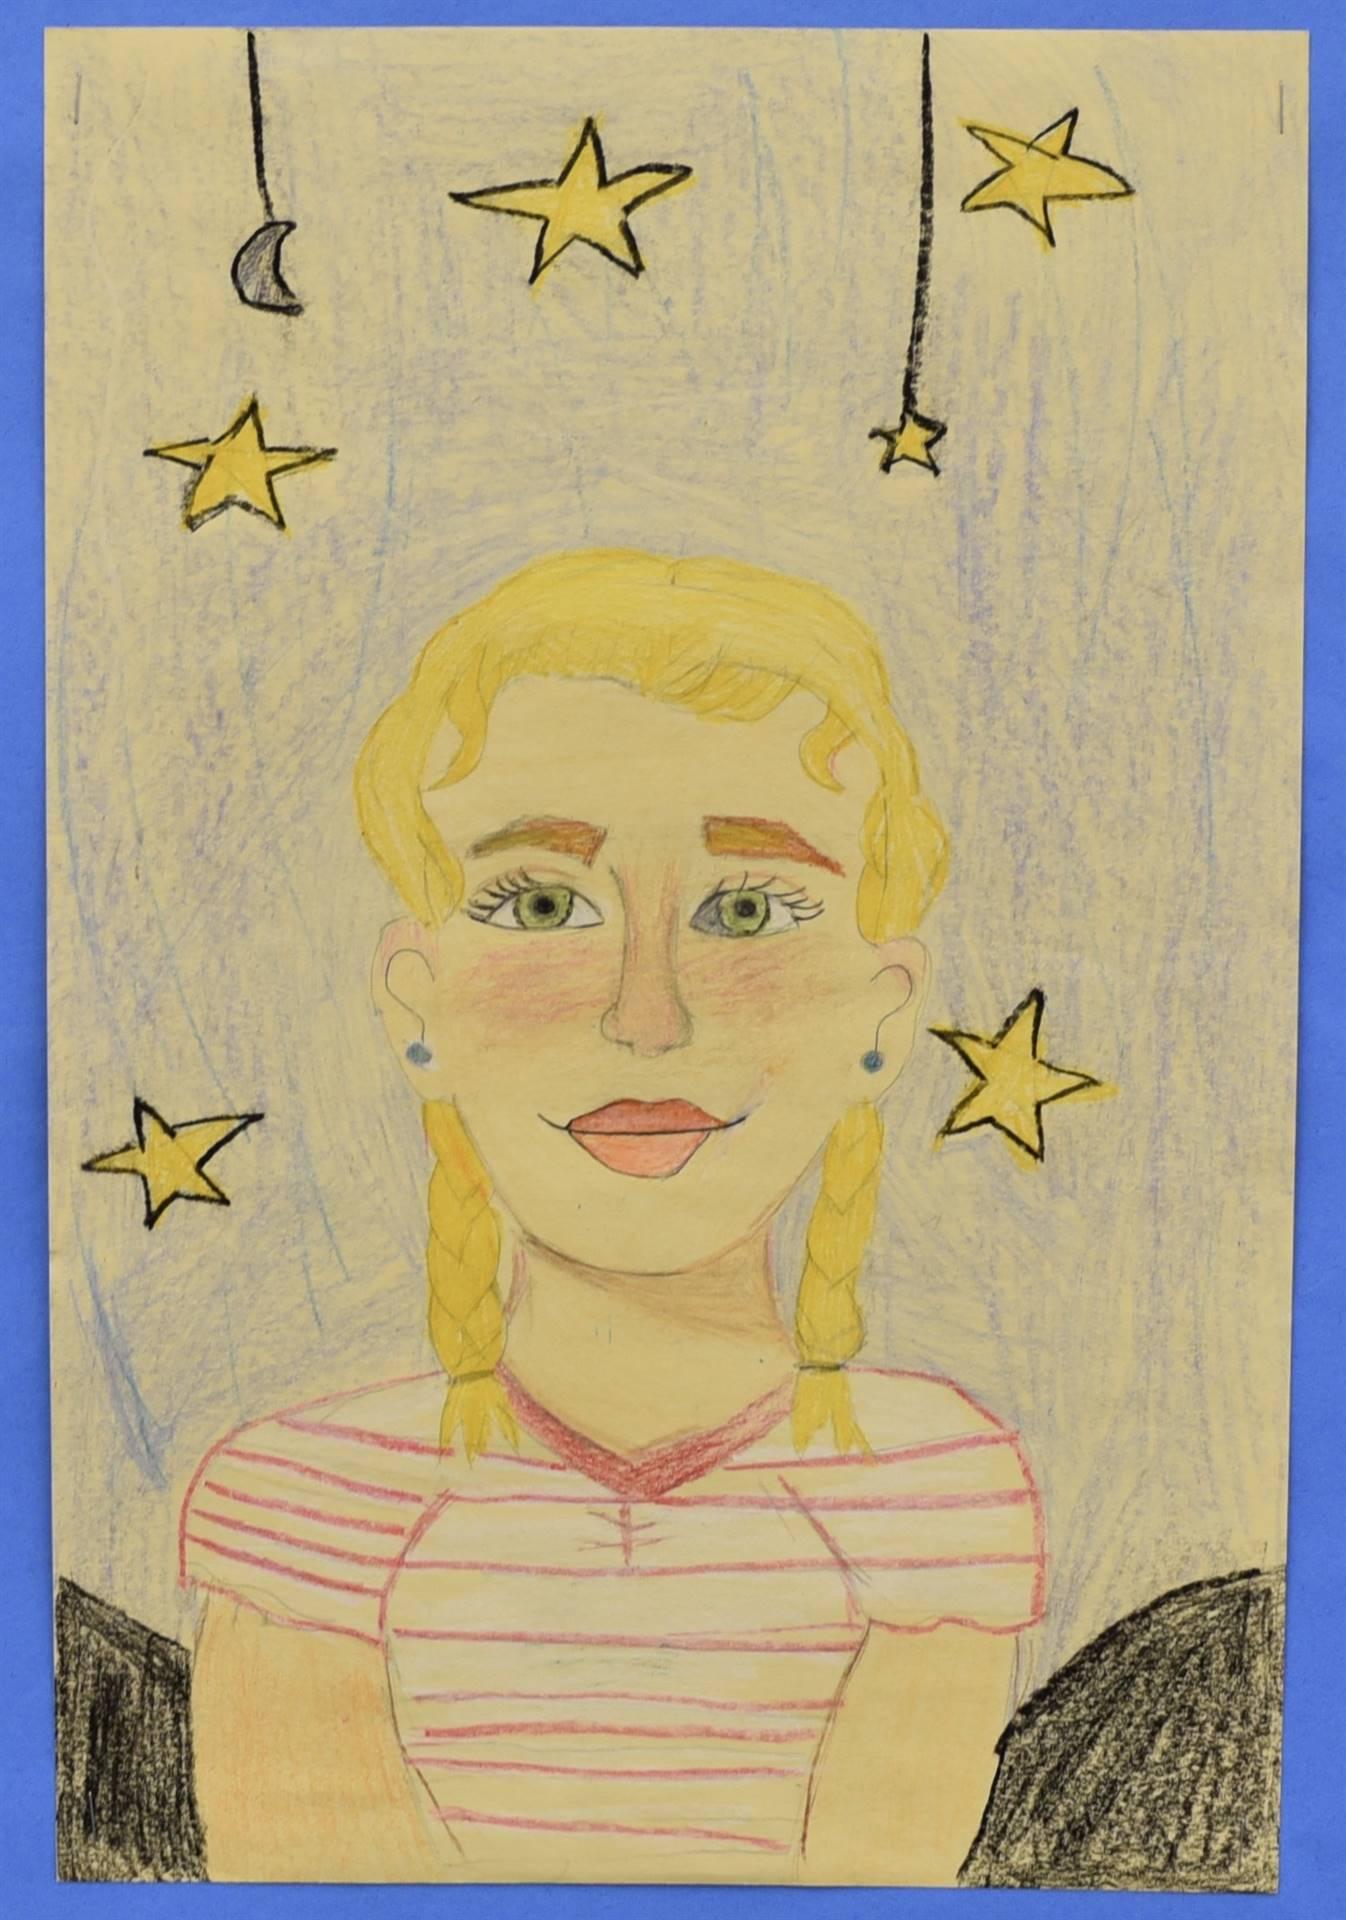 Brecksville-Broadview Hts. Middle School Art Projects 188